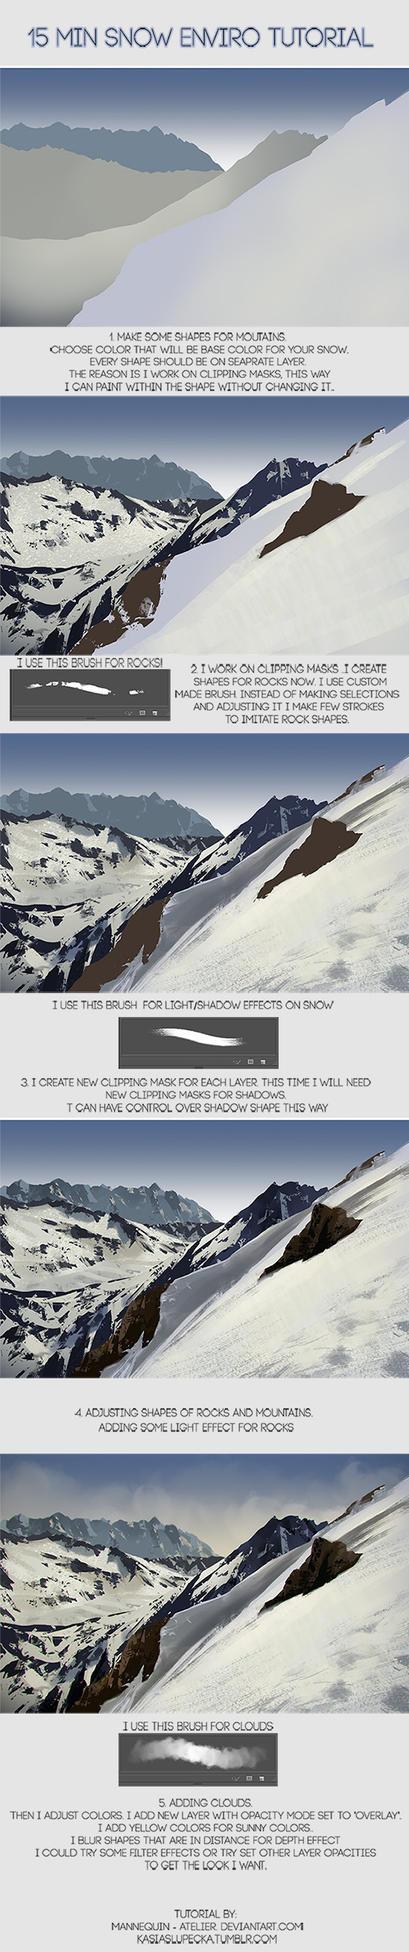 15 min Snowy enviro tutorial by mannequin-atelier